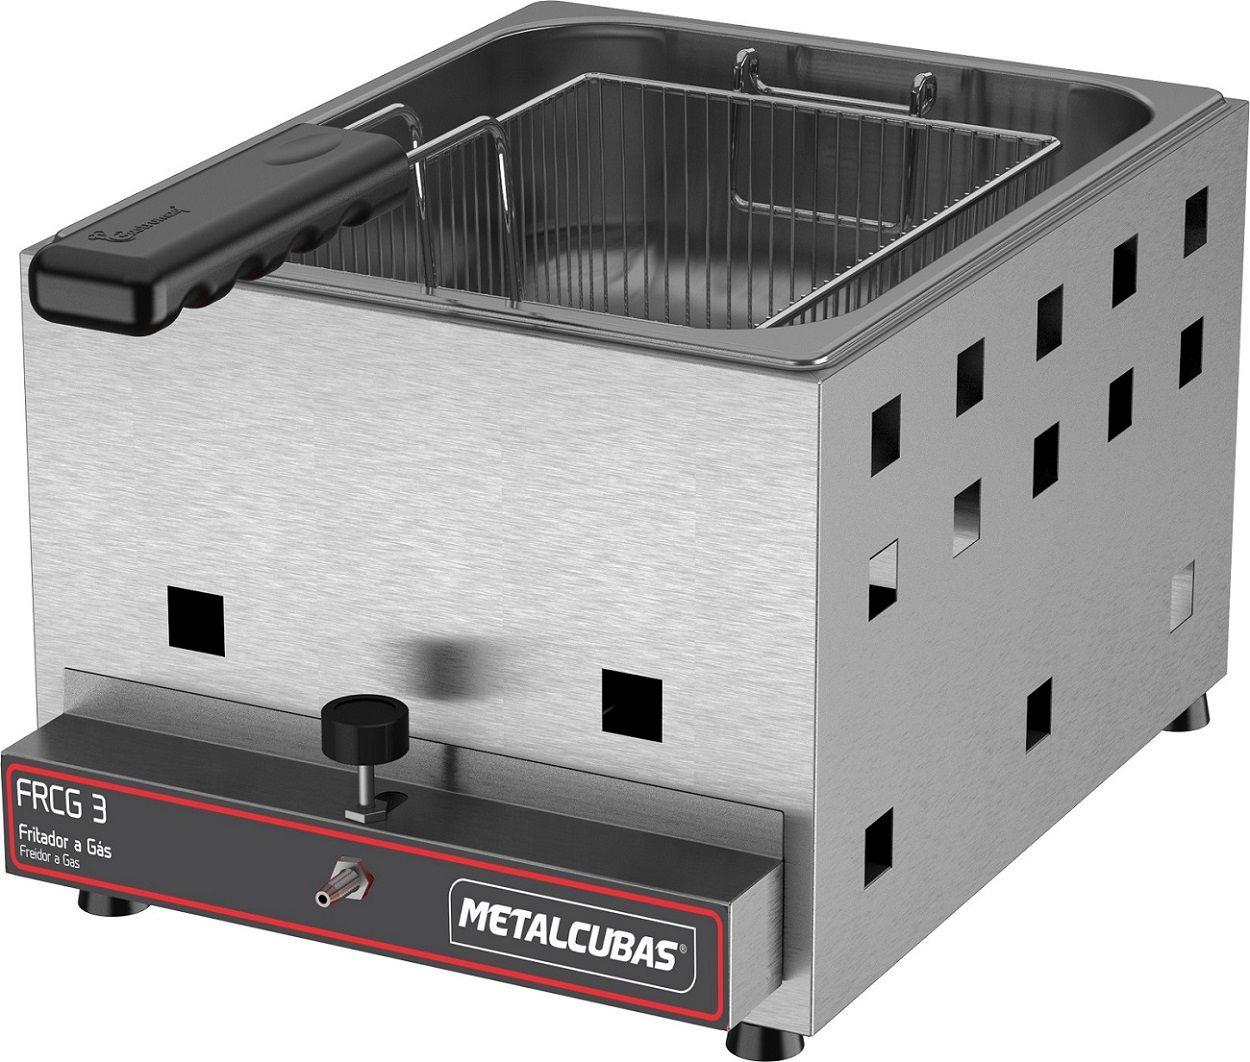 Fritadeira Industrial a Gás 3 Litros Metalcubas - FRCG 3  - Carmel Equipamentos